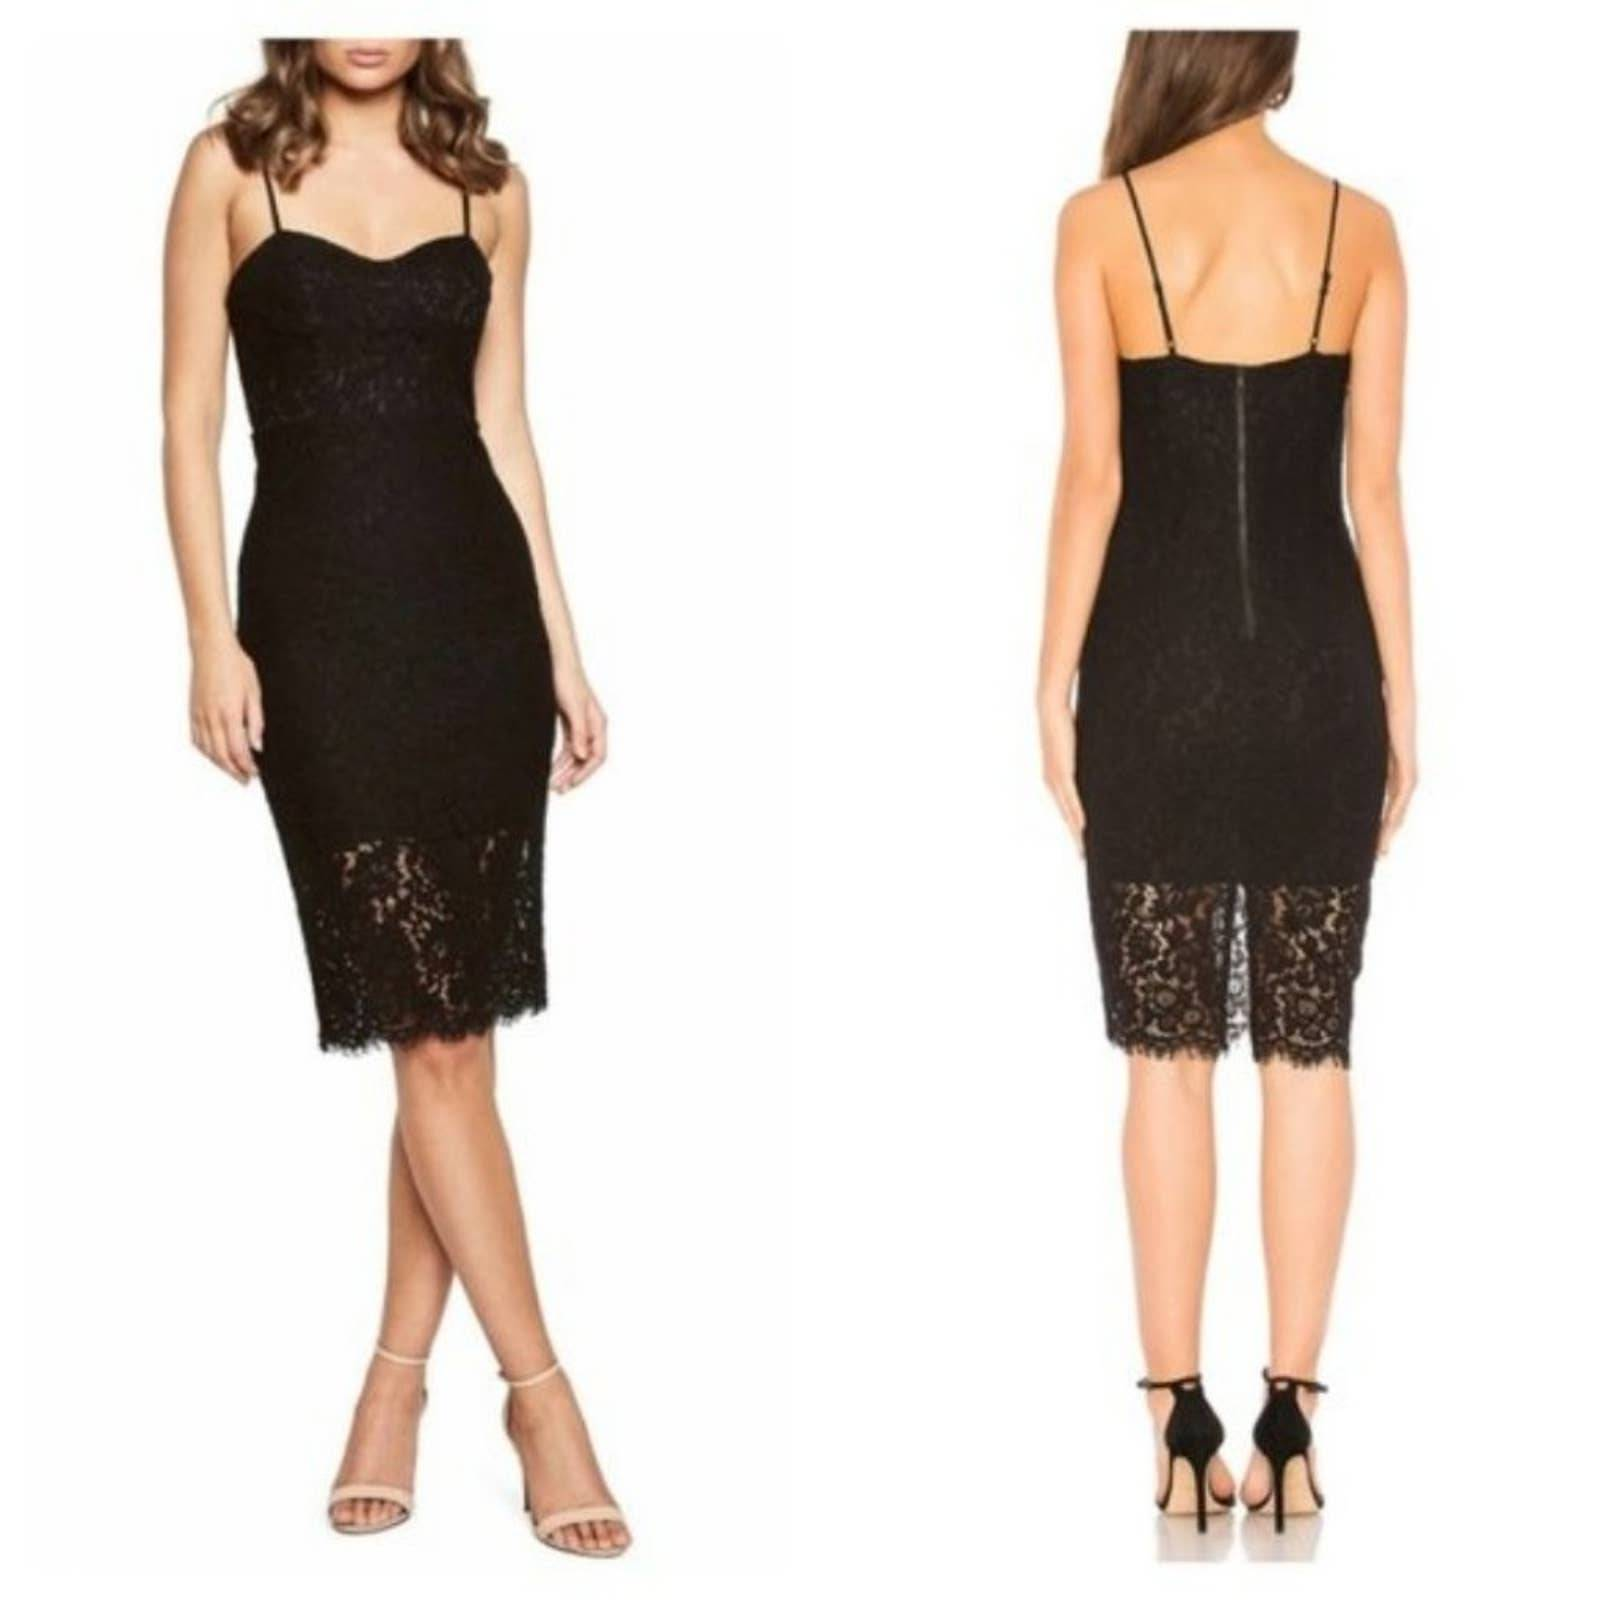 Bardot Open Back Lace Cocktail Dress